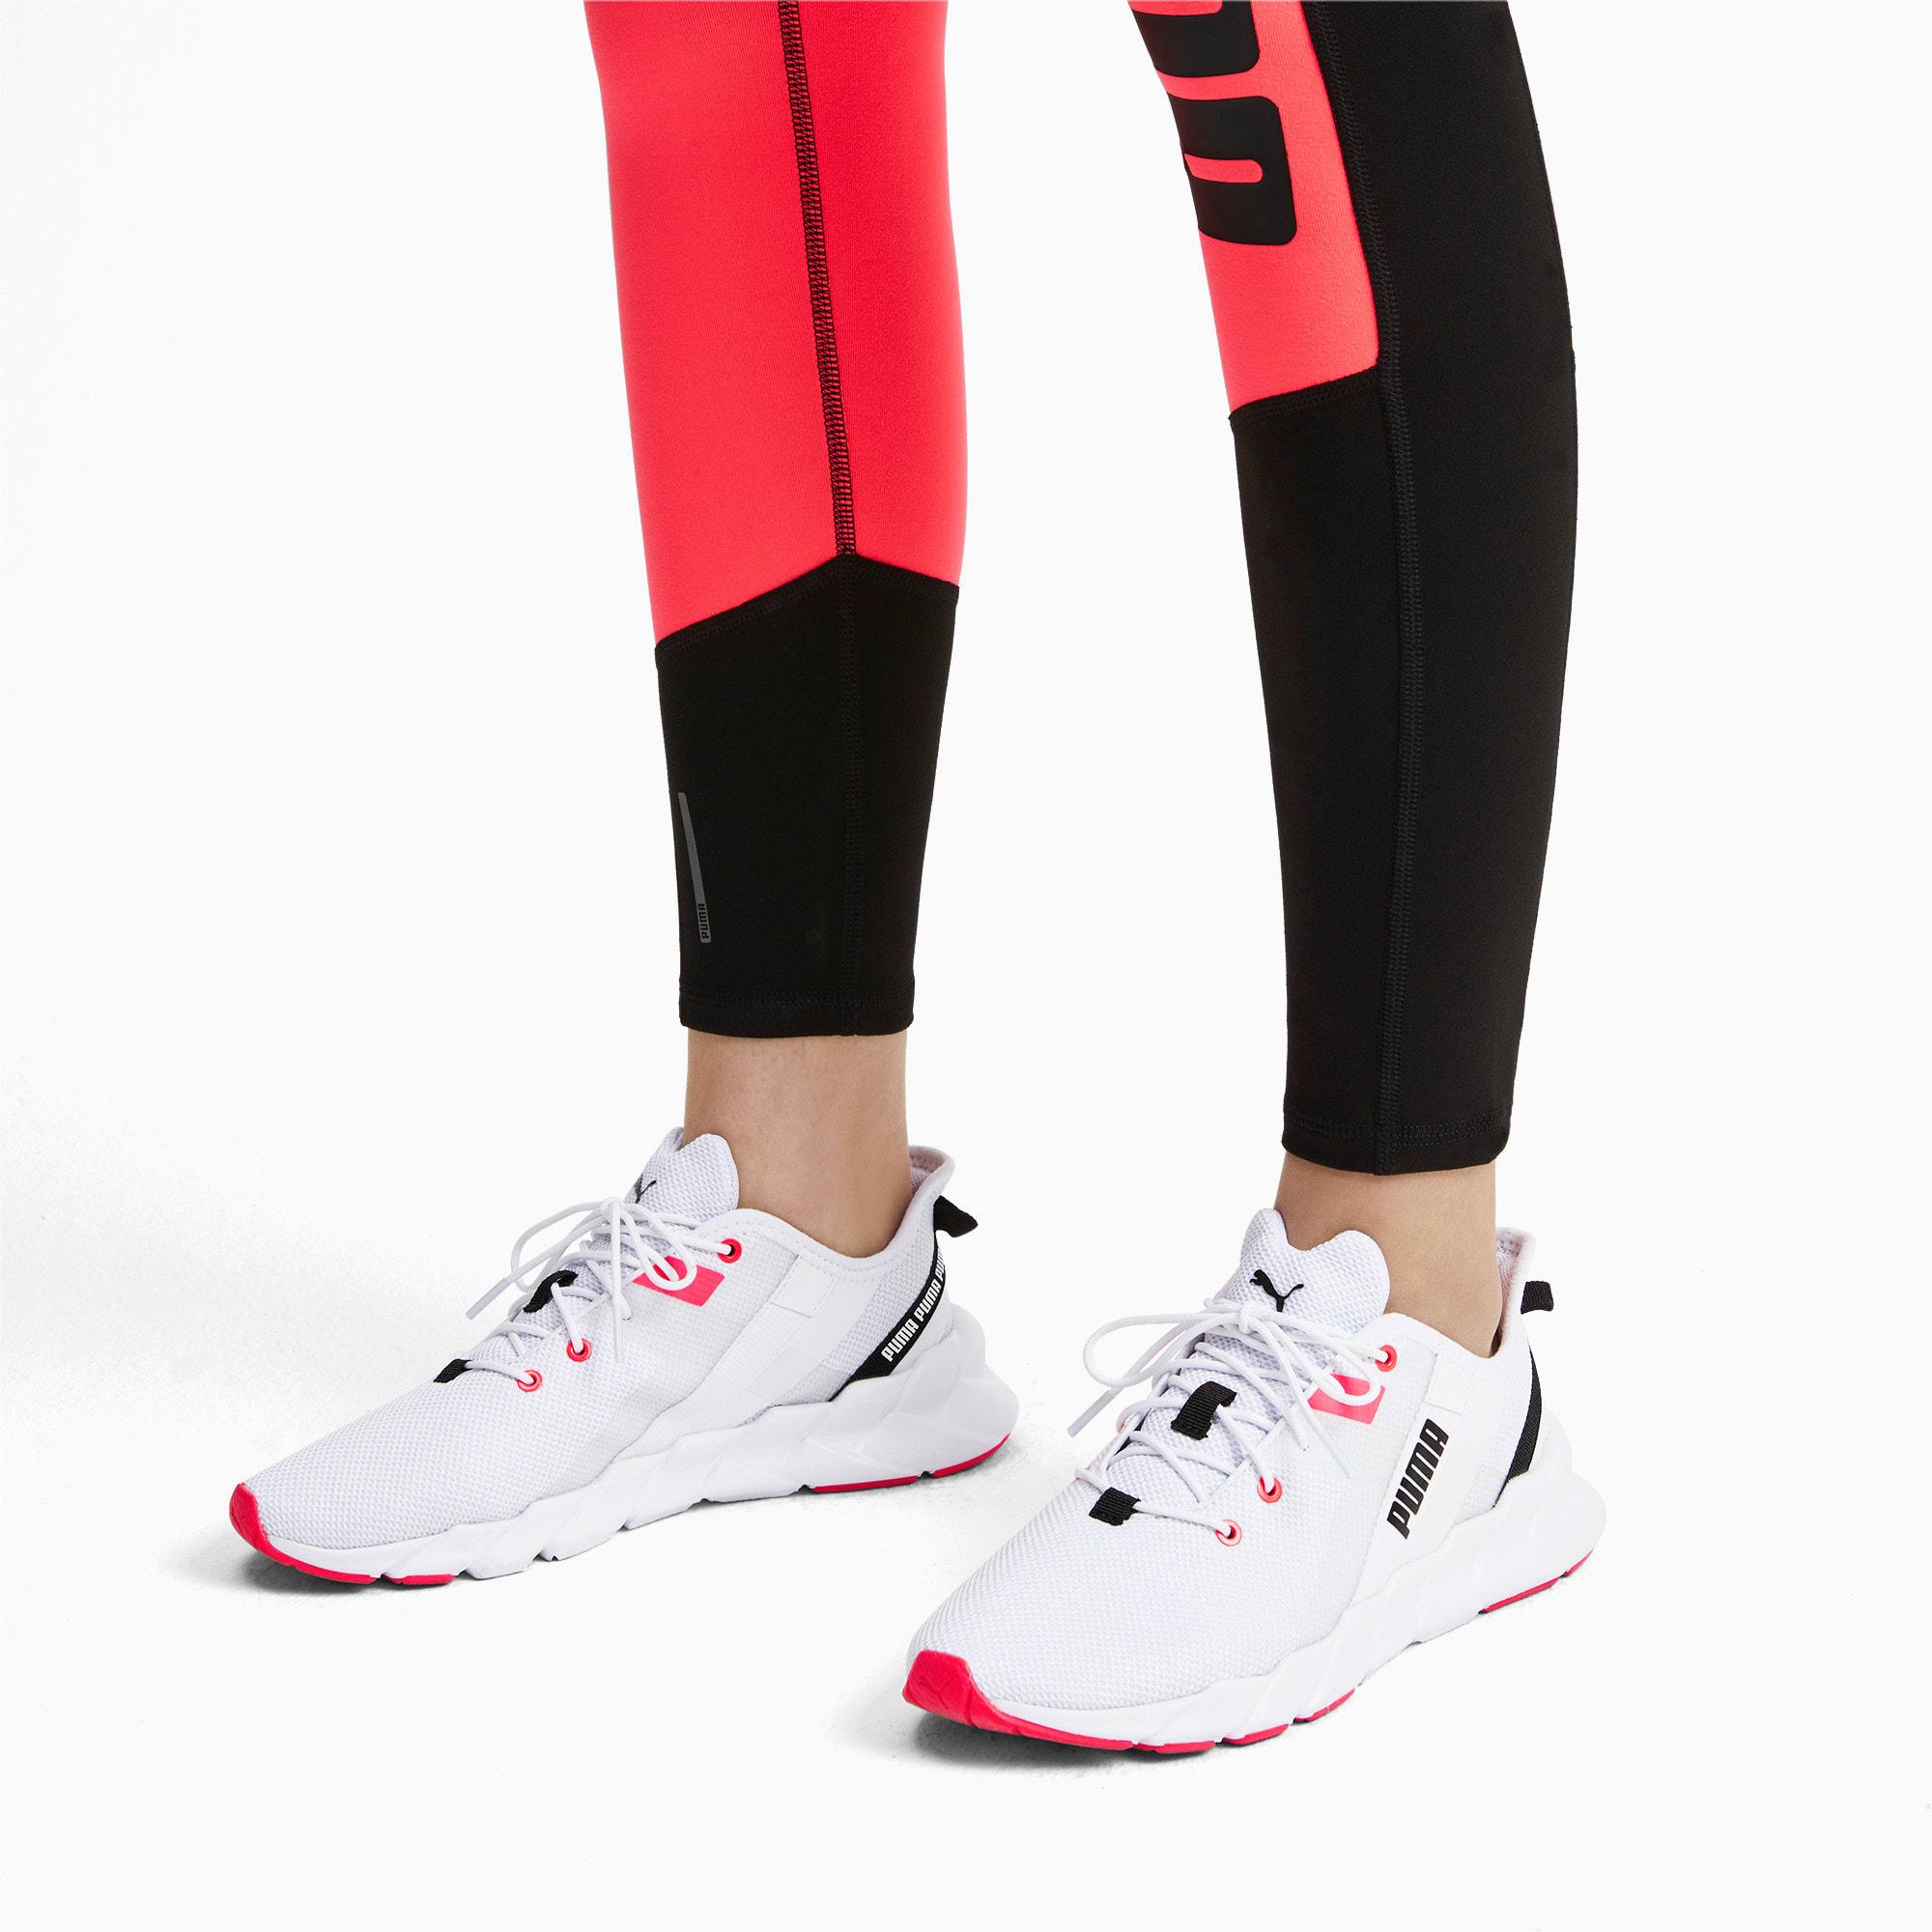 Thumbnail 2 of Weave XT Women's Training Shoes, Puma White-Pink Alert, medium-IND